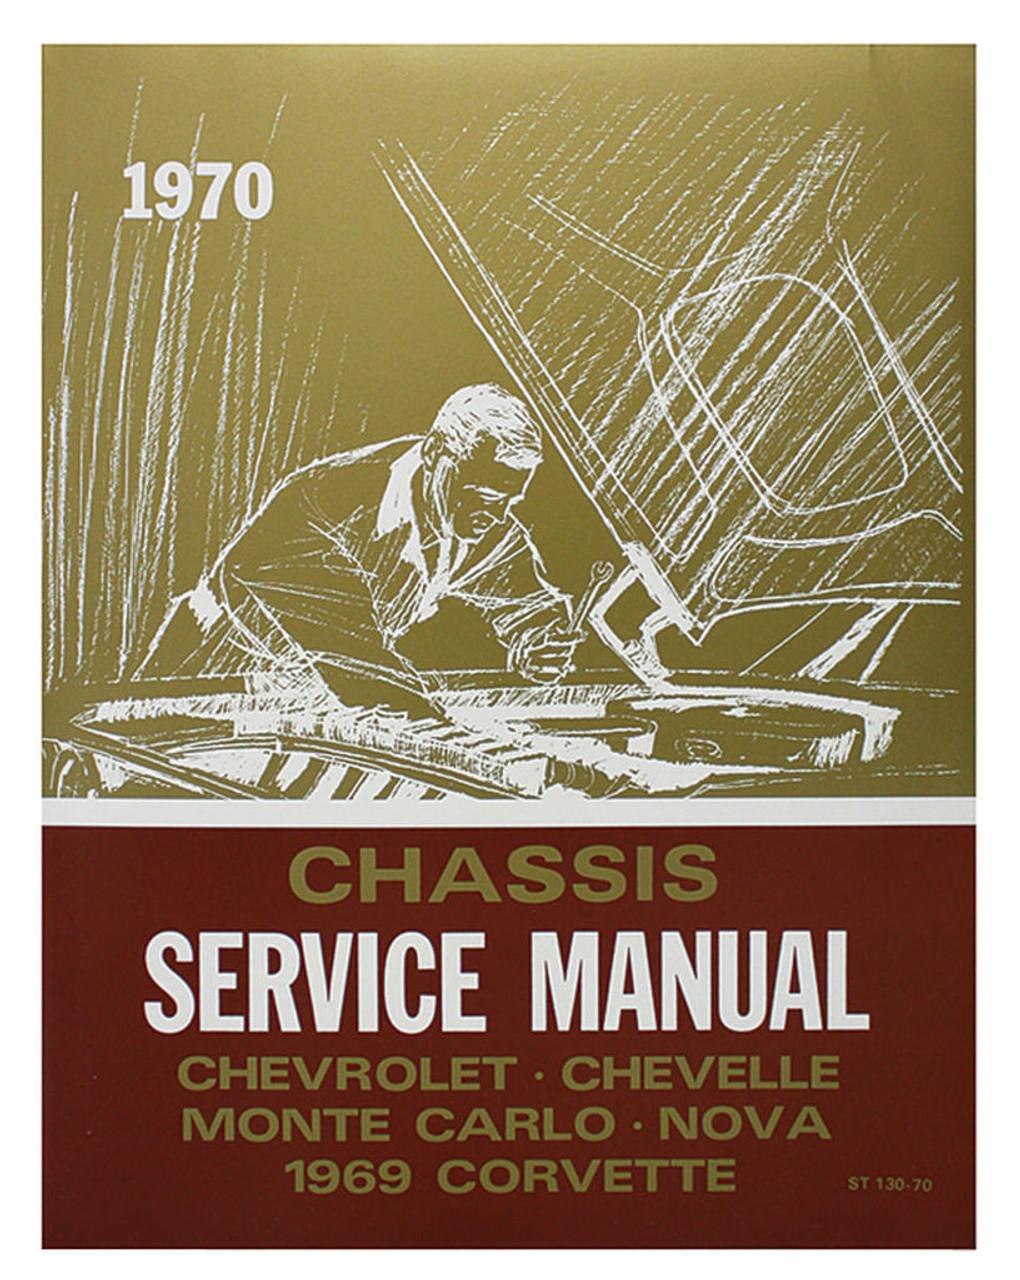 70 Chevy Chevelle Impala Nova Chassis Service Shop Manual